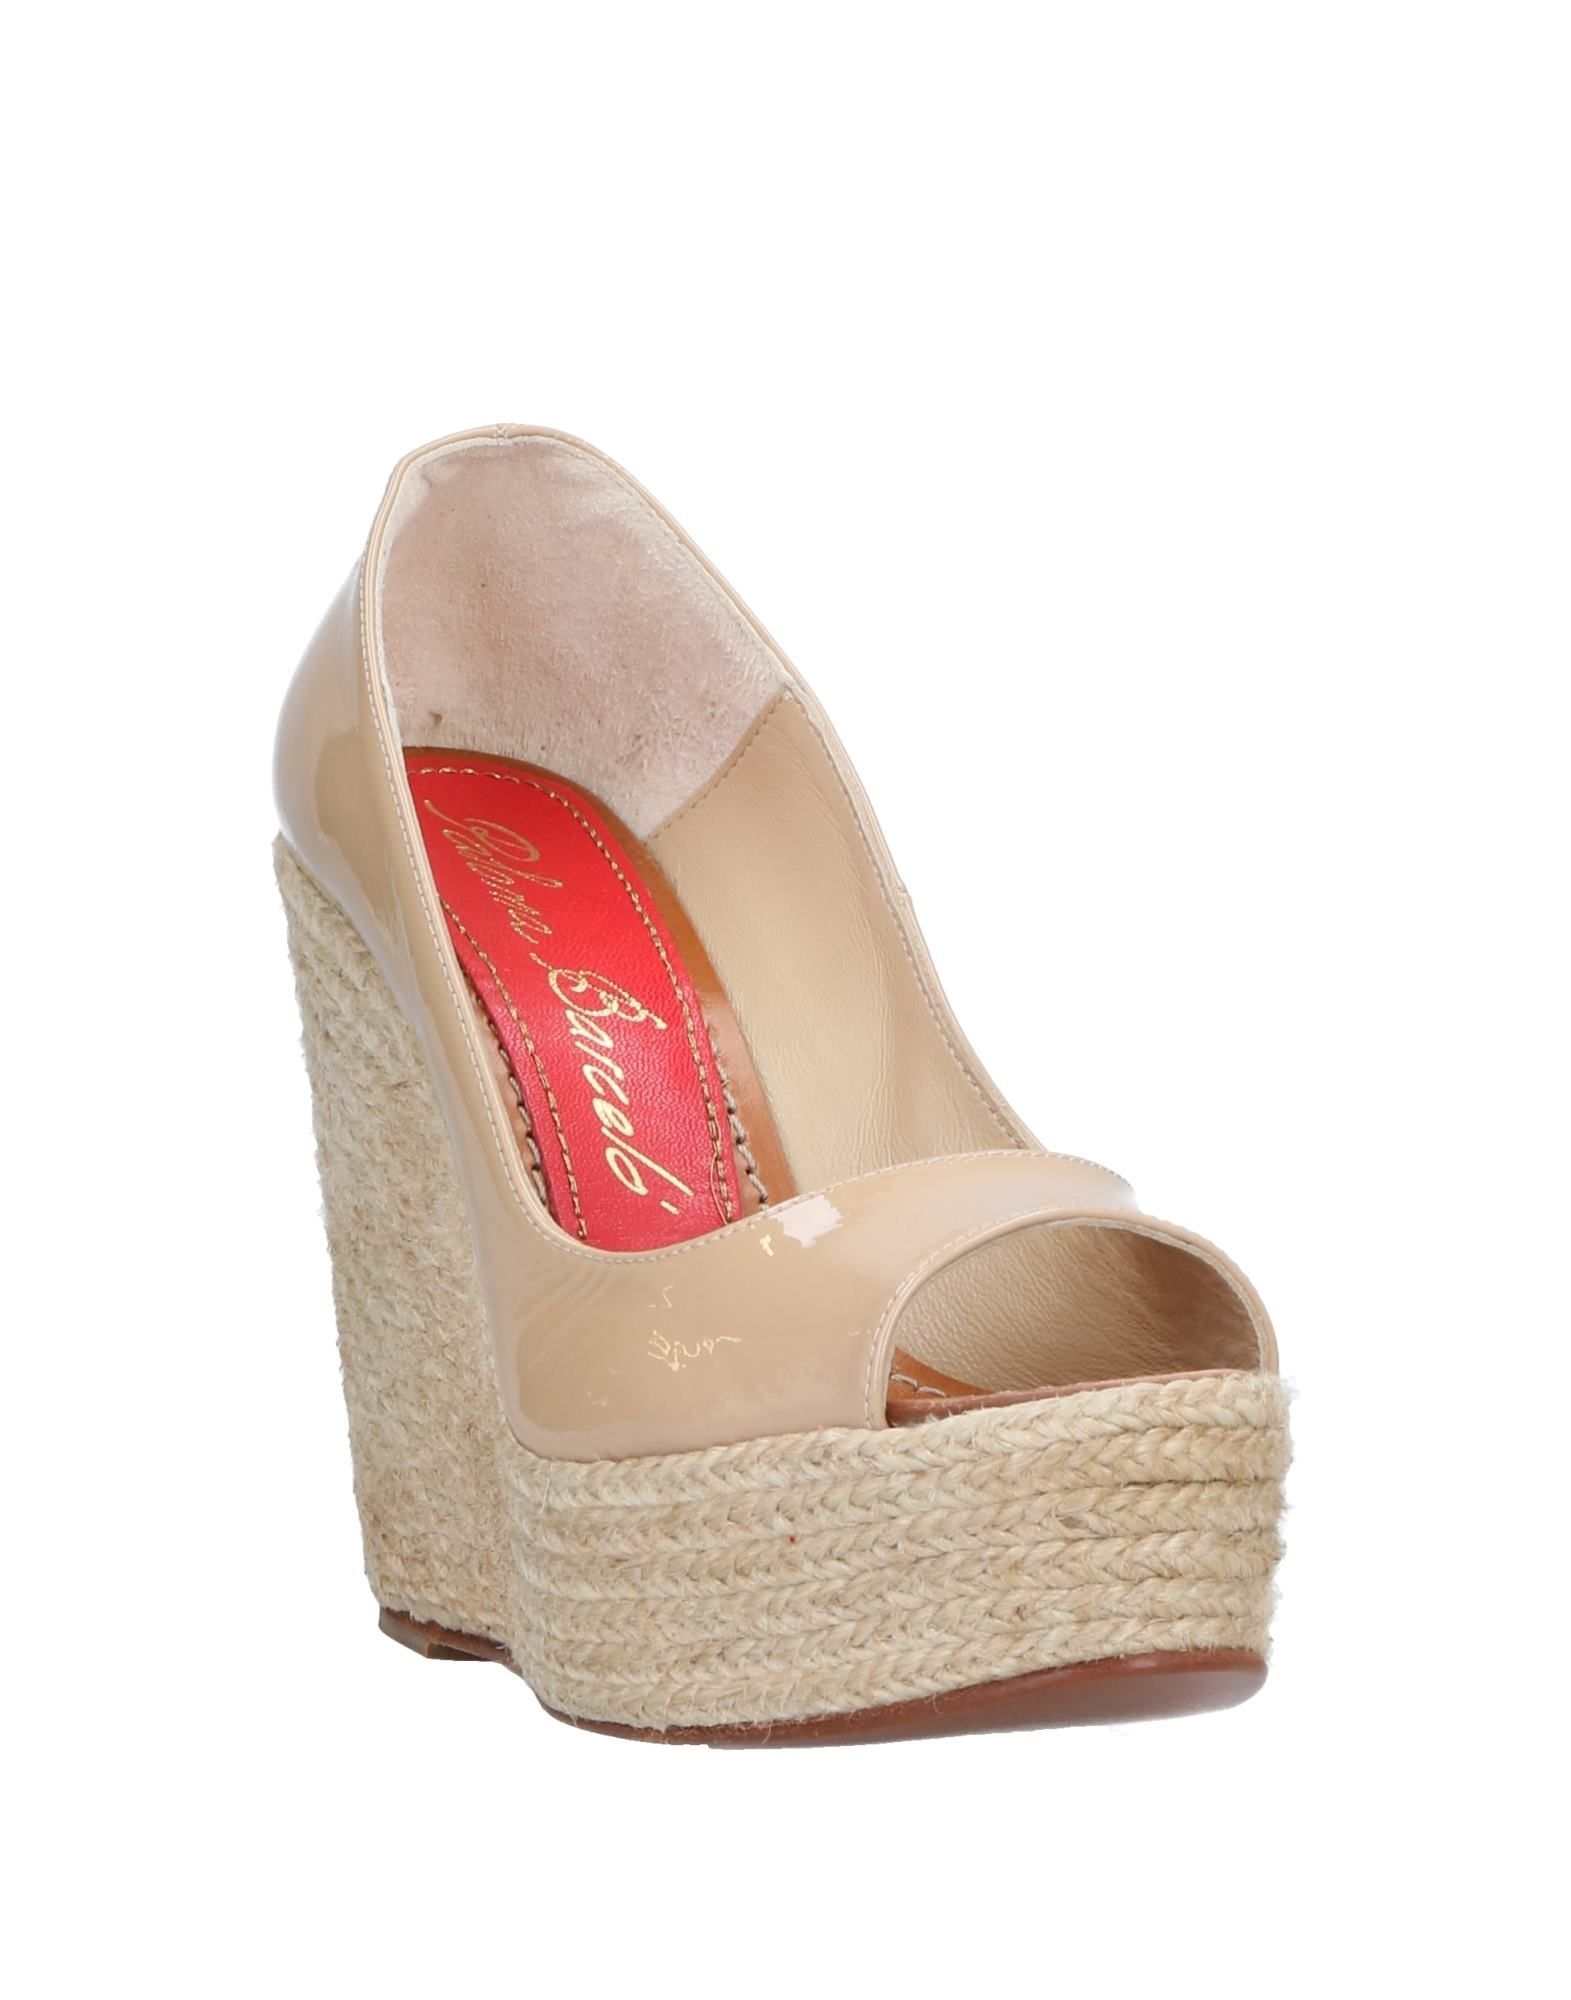 Rabatt Schuhe Paloma Barceló Pumps Pumps Pumps Damen  11539045XL 48bcbc